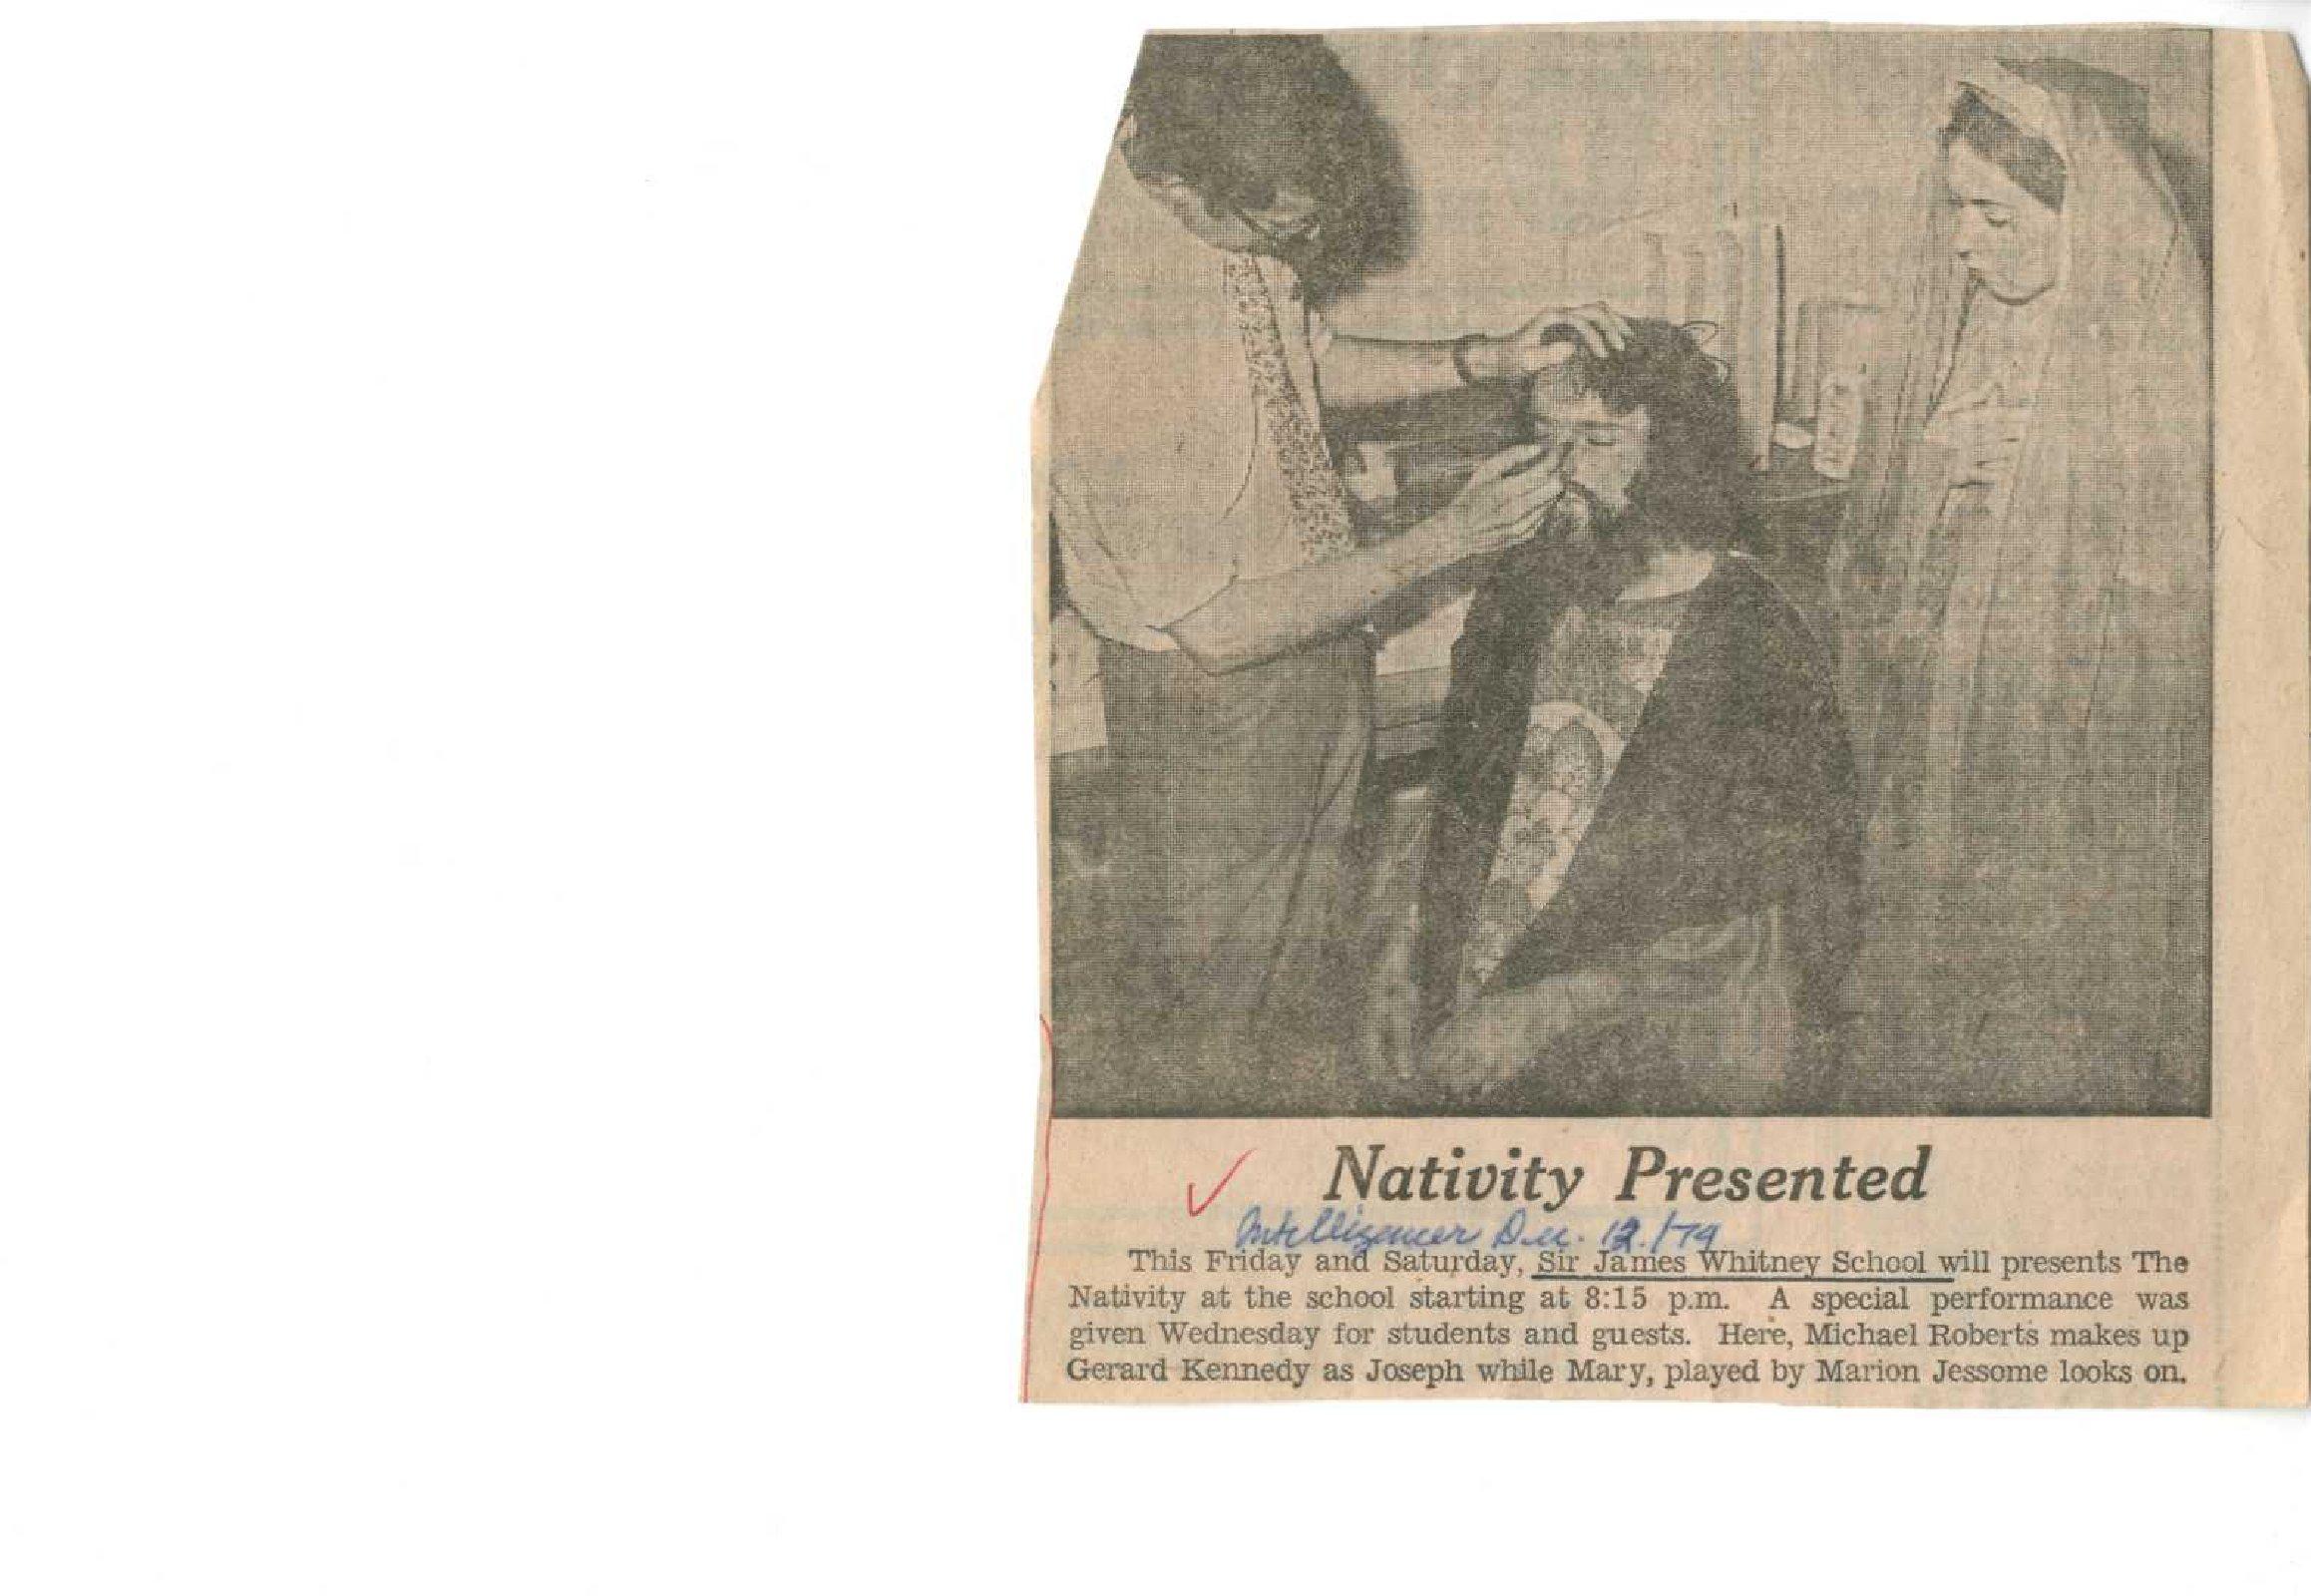 Nativity presented